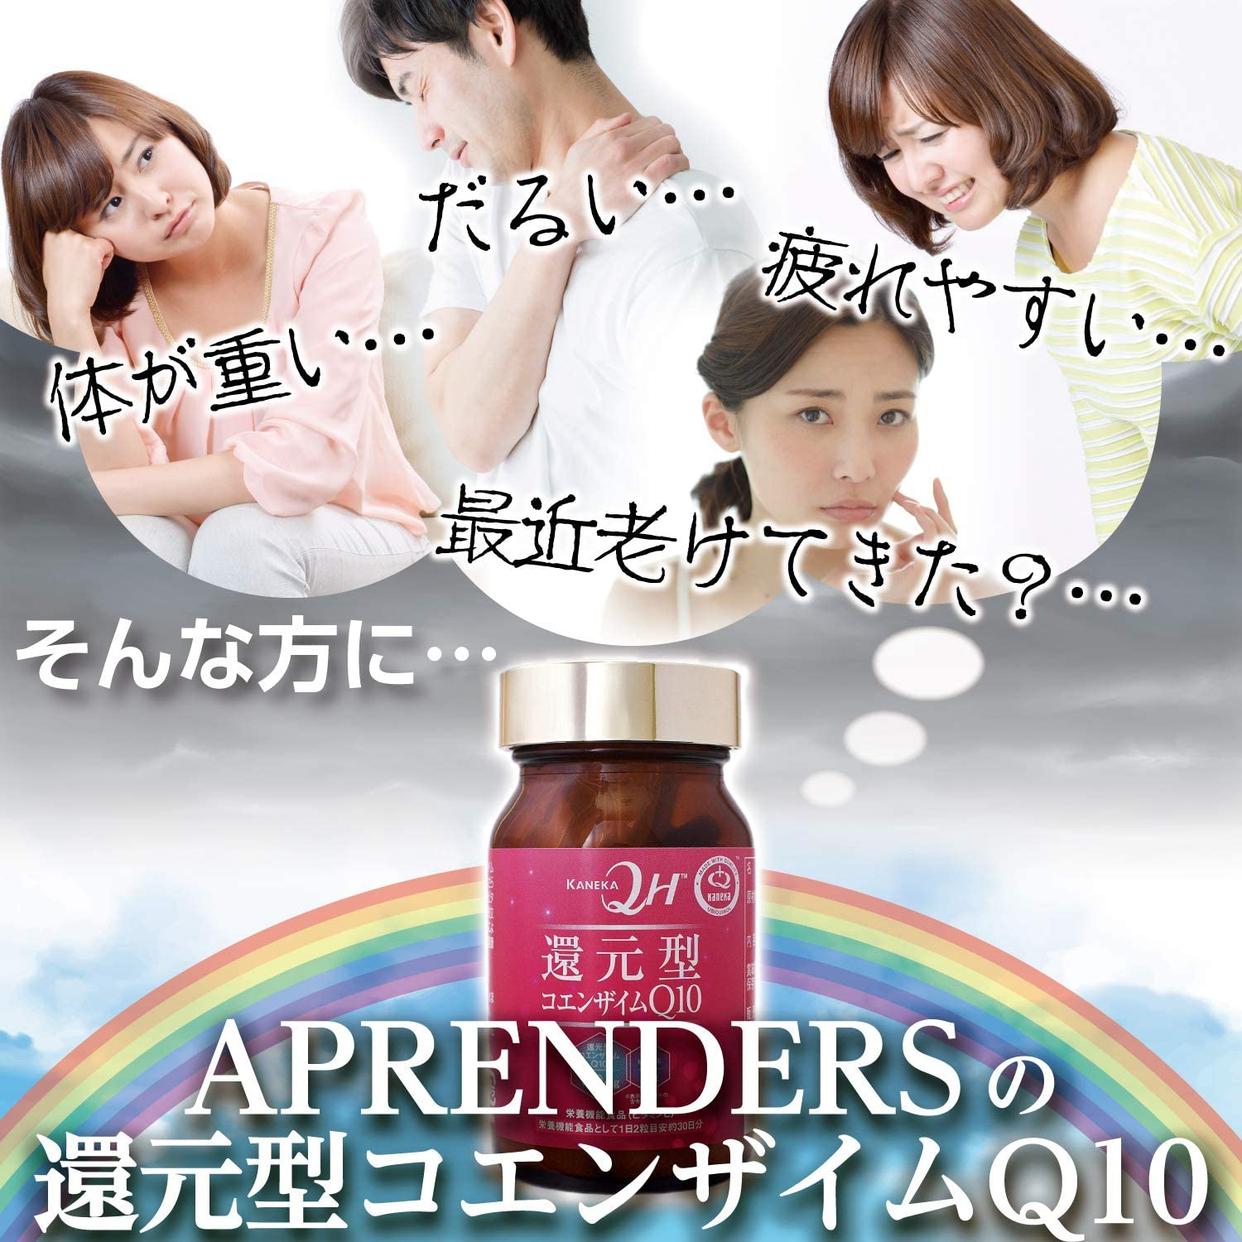 APRENDERS(アプレンダーズ) 還元型コエンザイムQ10の商品画像3